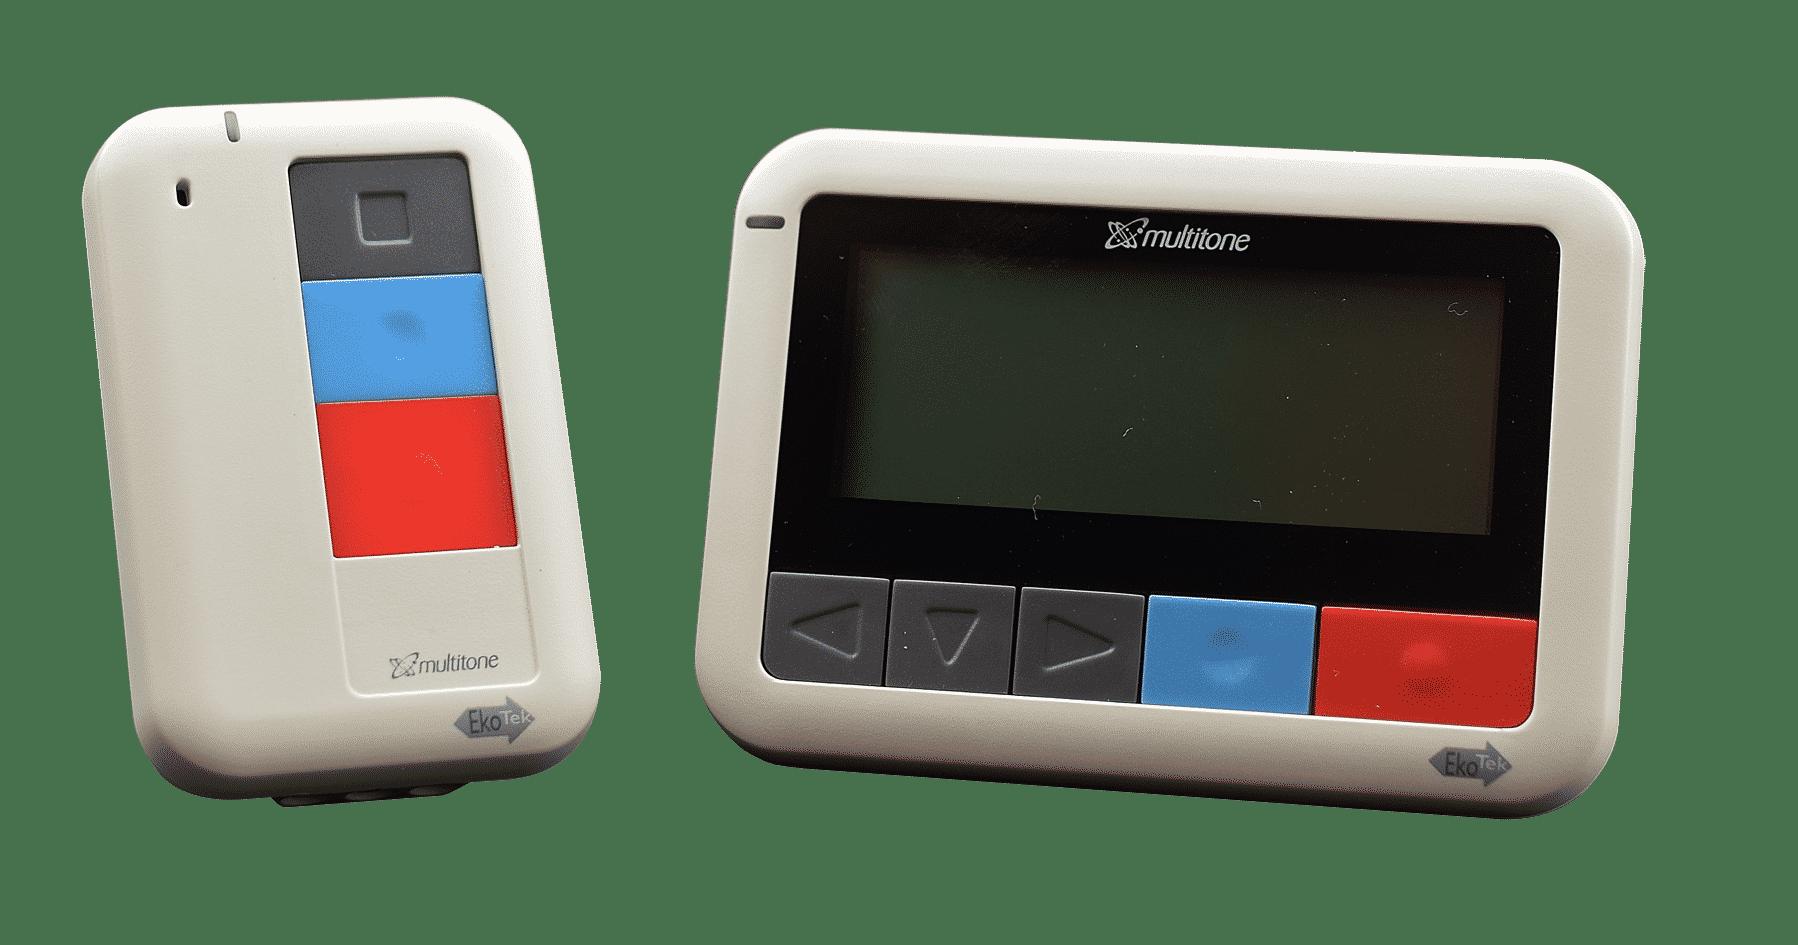 EkoTek Nurse Call button fob & messenger unit